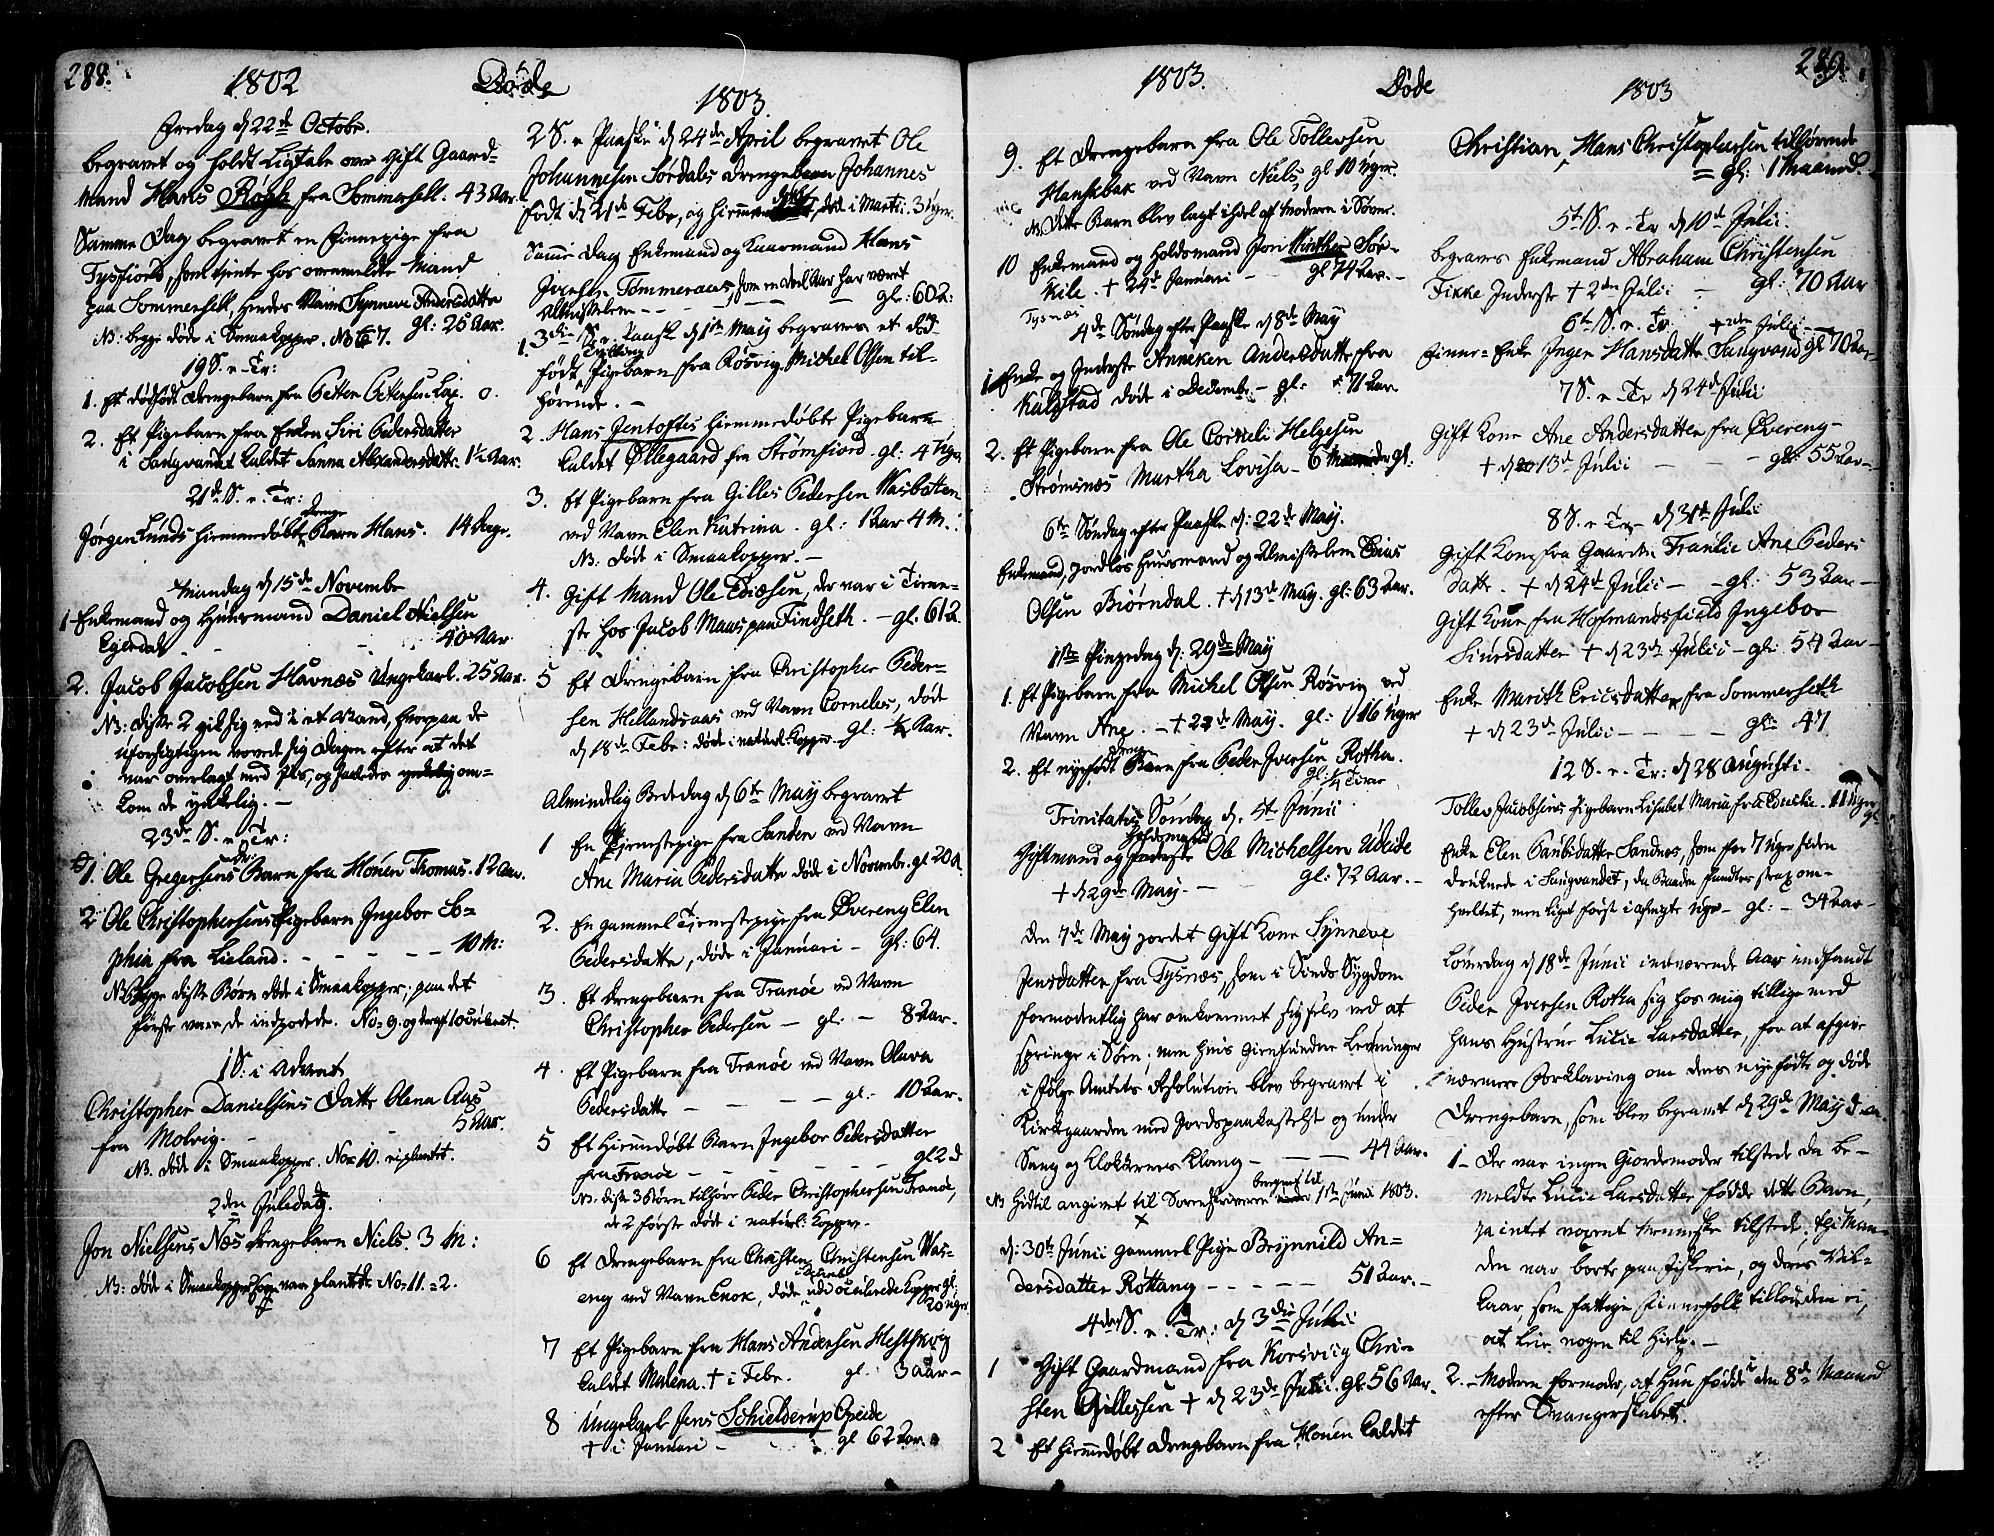 SAT, Ministerialprotokoller, klokkerbøker og fødselsregistre - Nordland, 859/L0841: Ministerialbok nr. 859A01, 1766-1821, s. 288-289